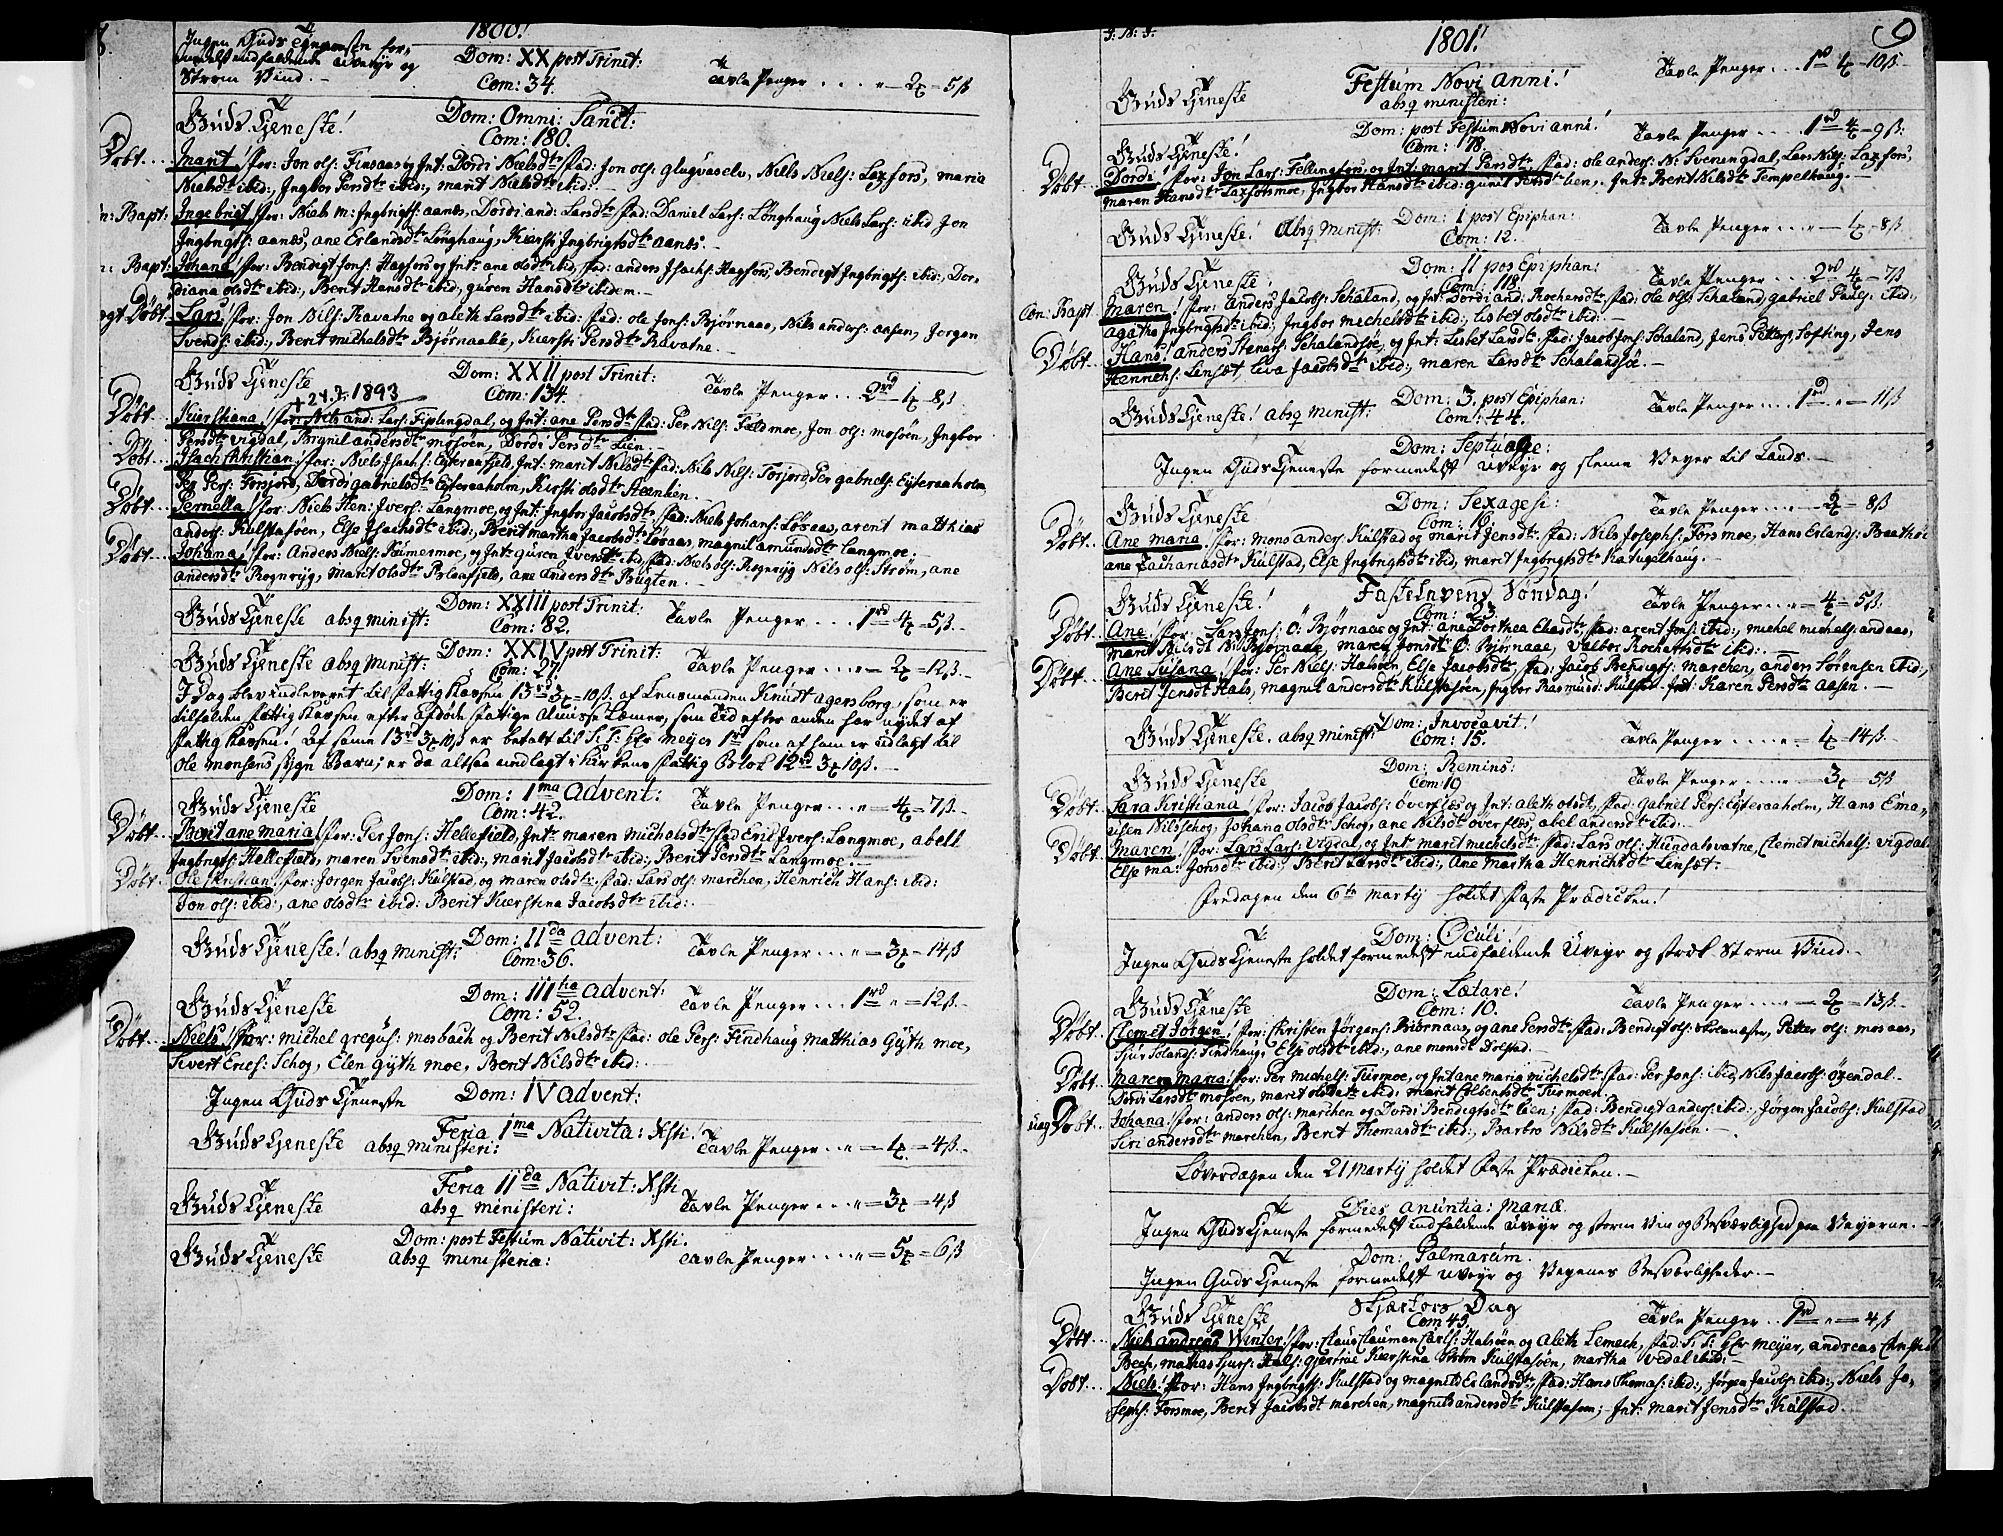 SAT, Ministerialprotokoller, klokkerbøker og fødselsregistre - Nordland, 820/L0287: Ministerialbok nr. 820A08, 1800-1819, s. 8-9